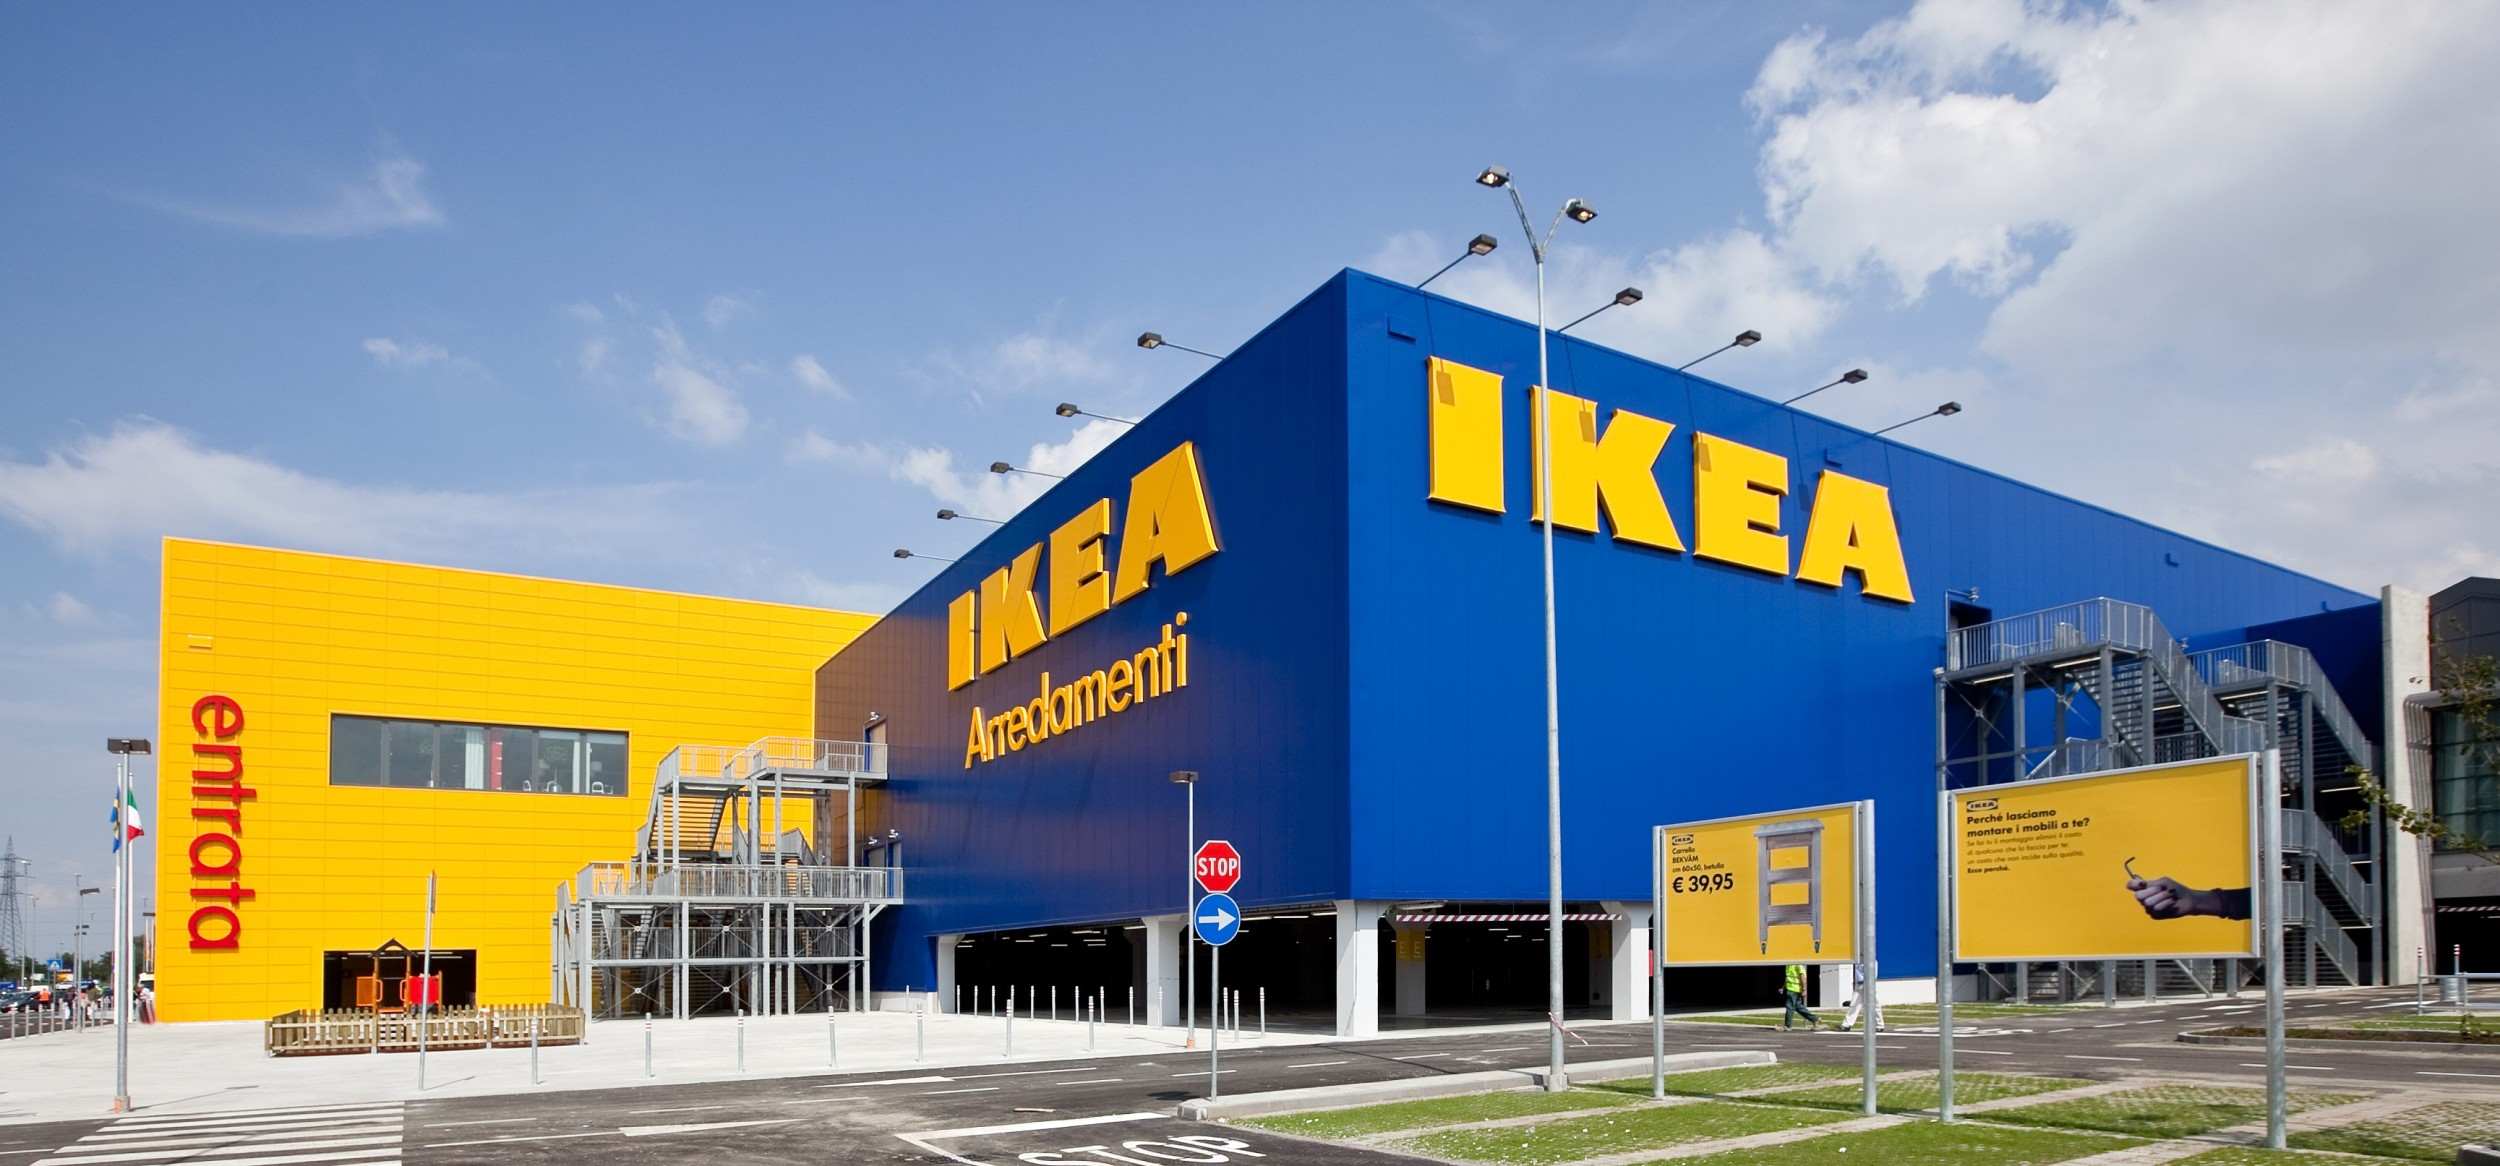 Langkah-Langkah Berbelanja Di IKEA